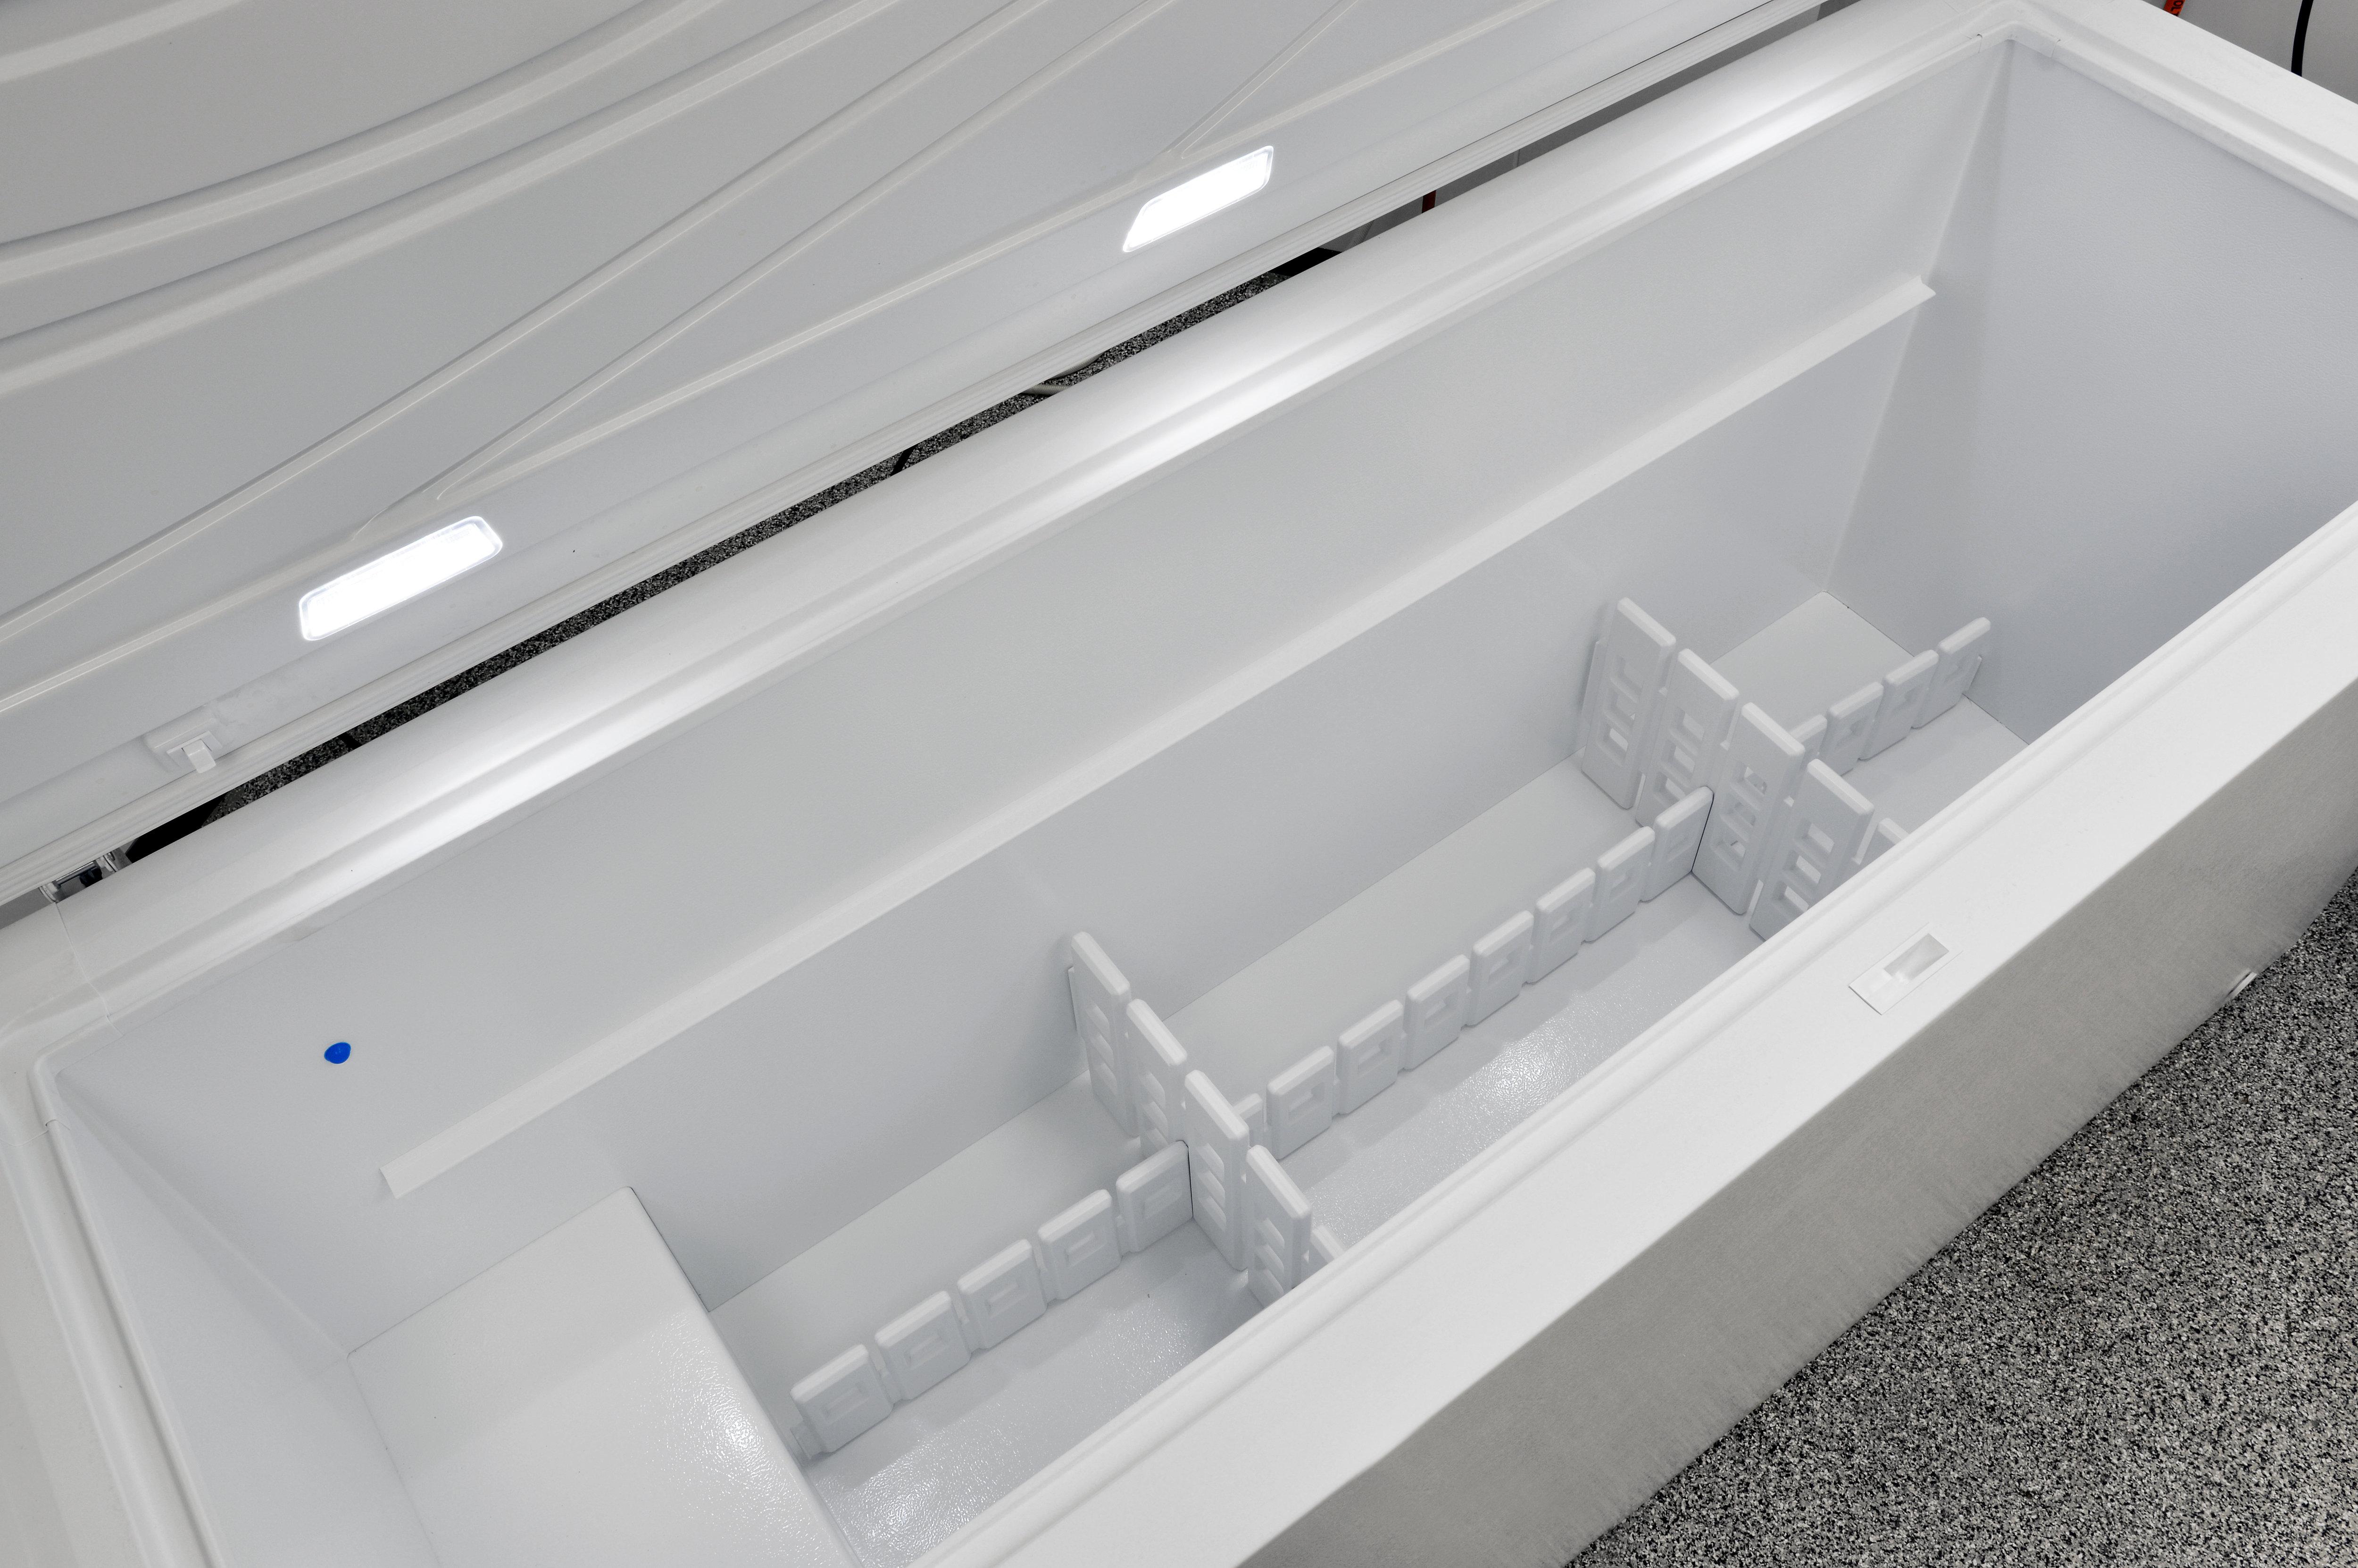 The Kenmore Elite 17202's adjustable dividers help organize your food storage.